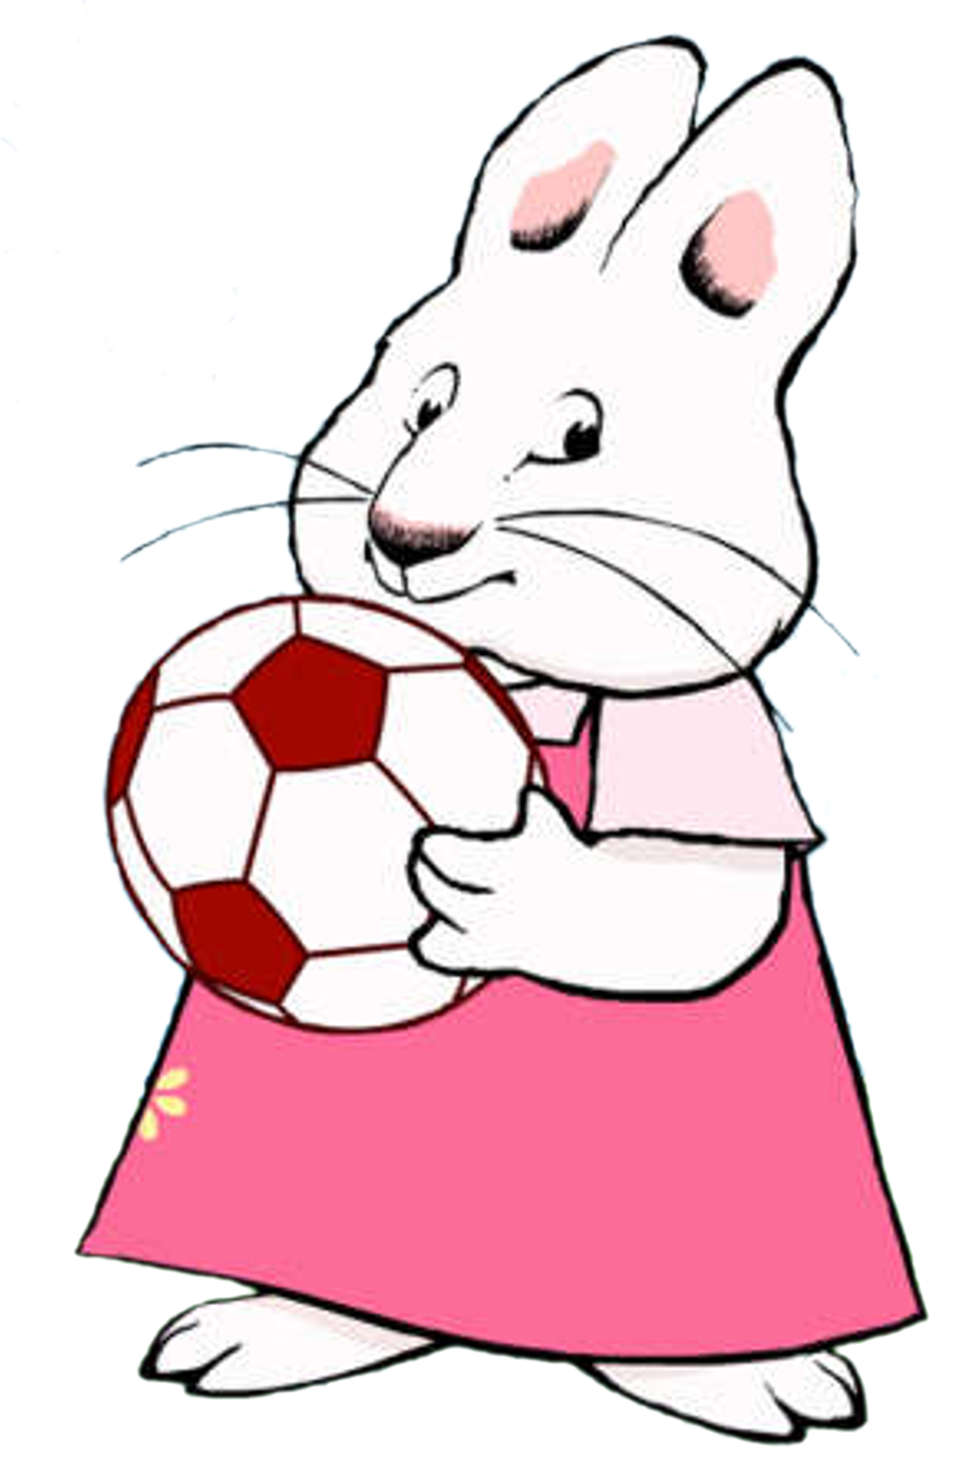 976x1480 Cartoon Characters 5 New Png's (Yo Kai Watch Kate And Mim Mim